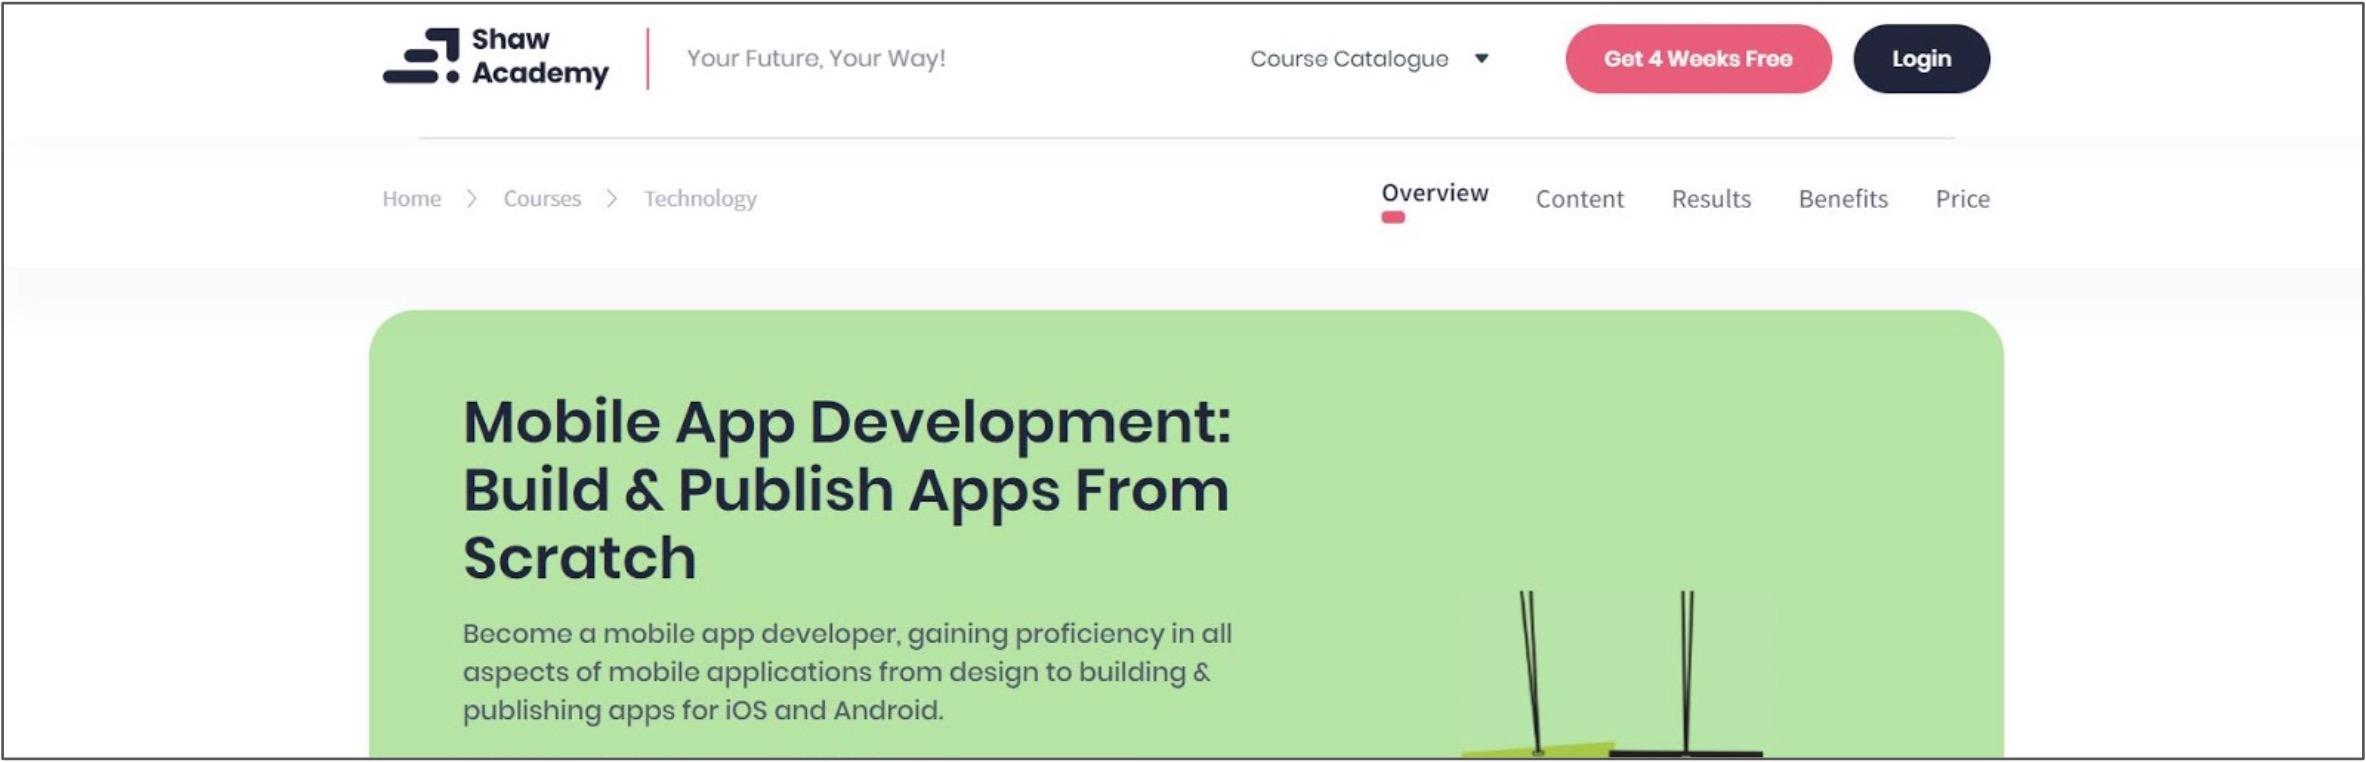 Screenshot of a Mobile App Development corse on Show Academy